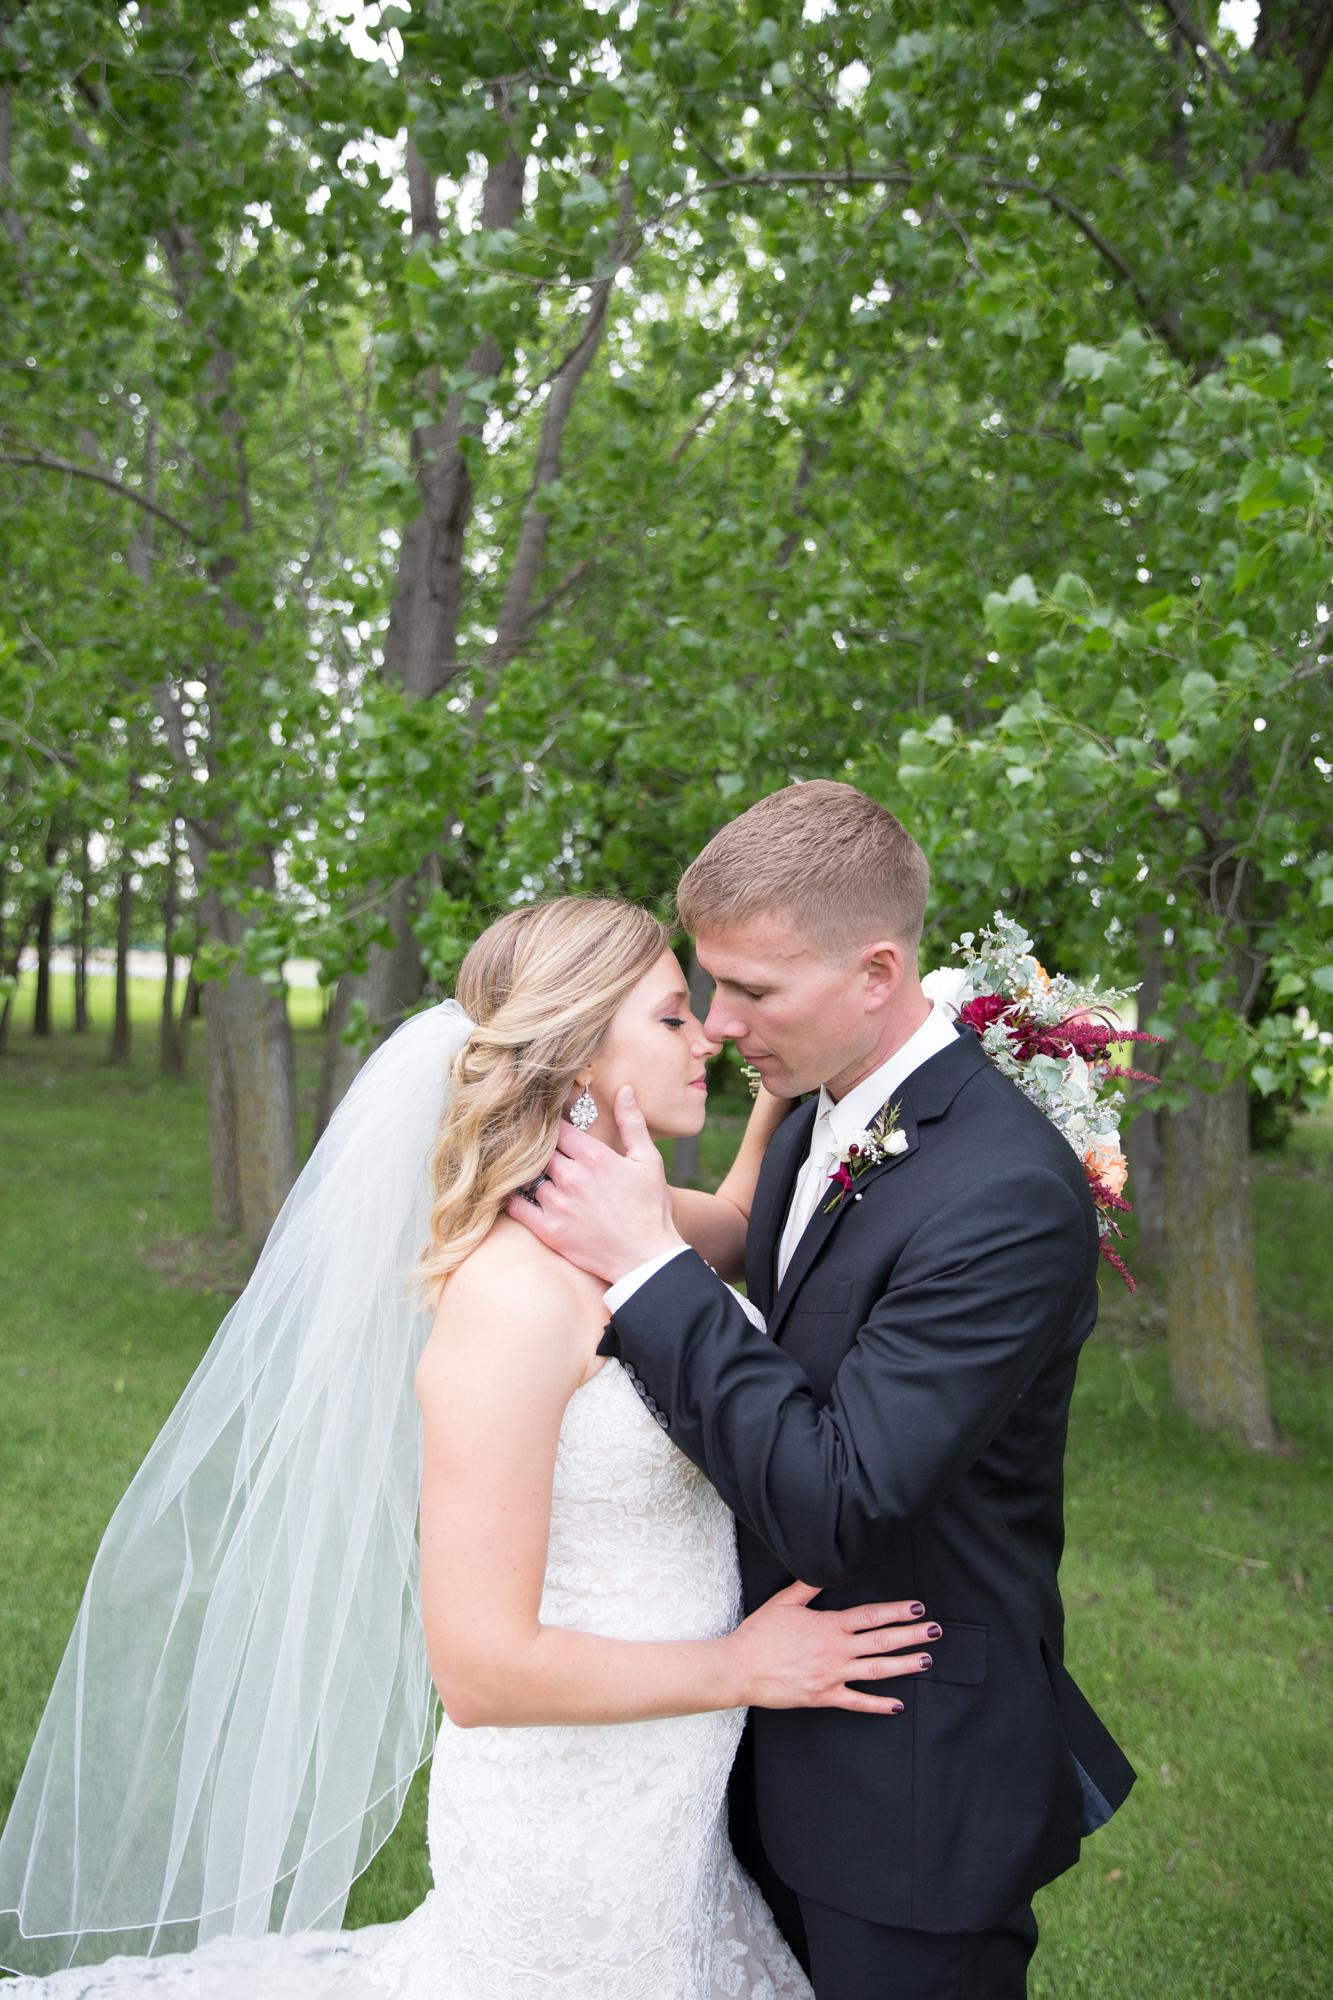 Wedding at Brighton Acres in Oshkosh Wedding - Whit Meza Photography